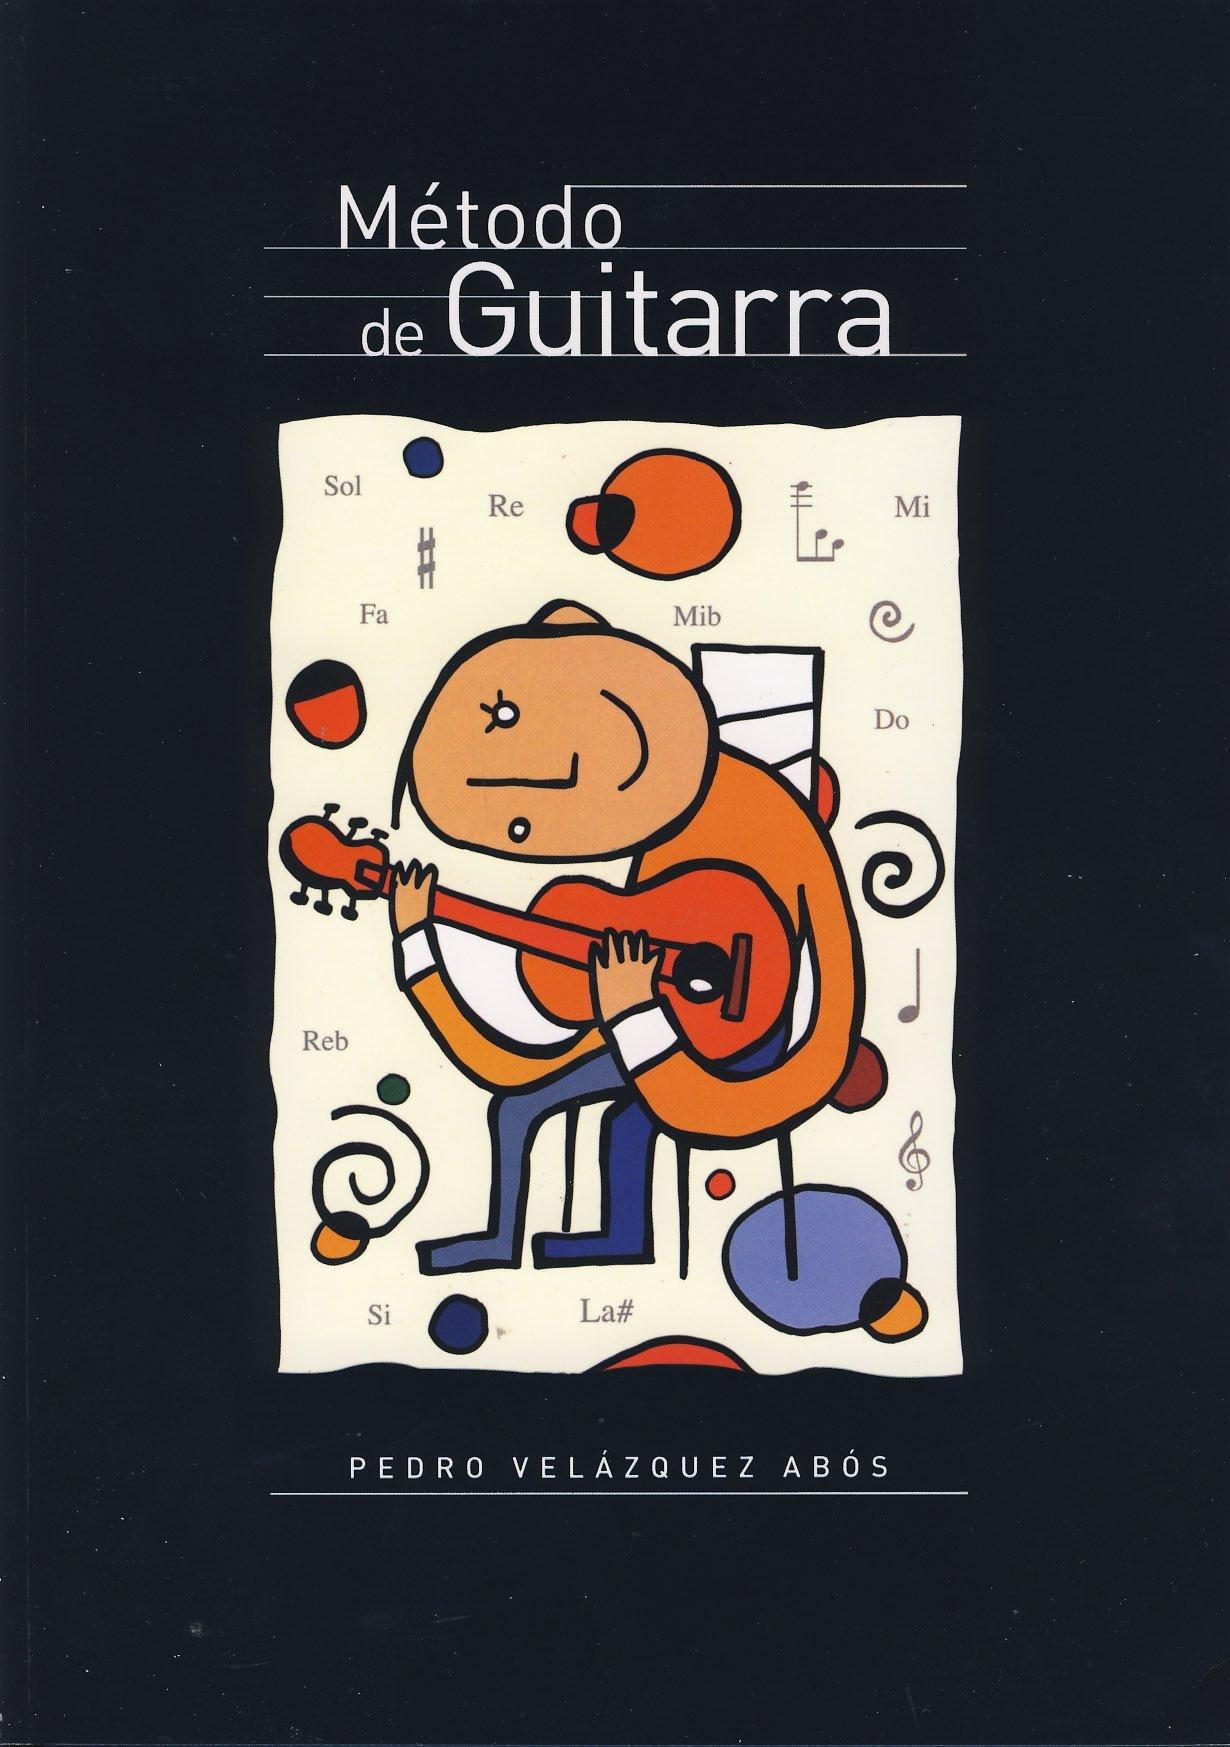 VELAZQUEZ ABOS P. - Metodo de Guitarra (Musica y Cifra) para Guitarra (Spanish) Paperback – 1995